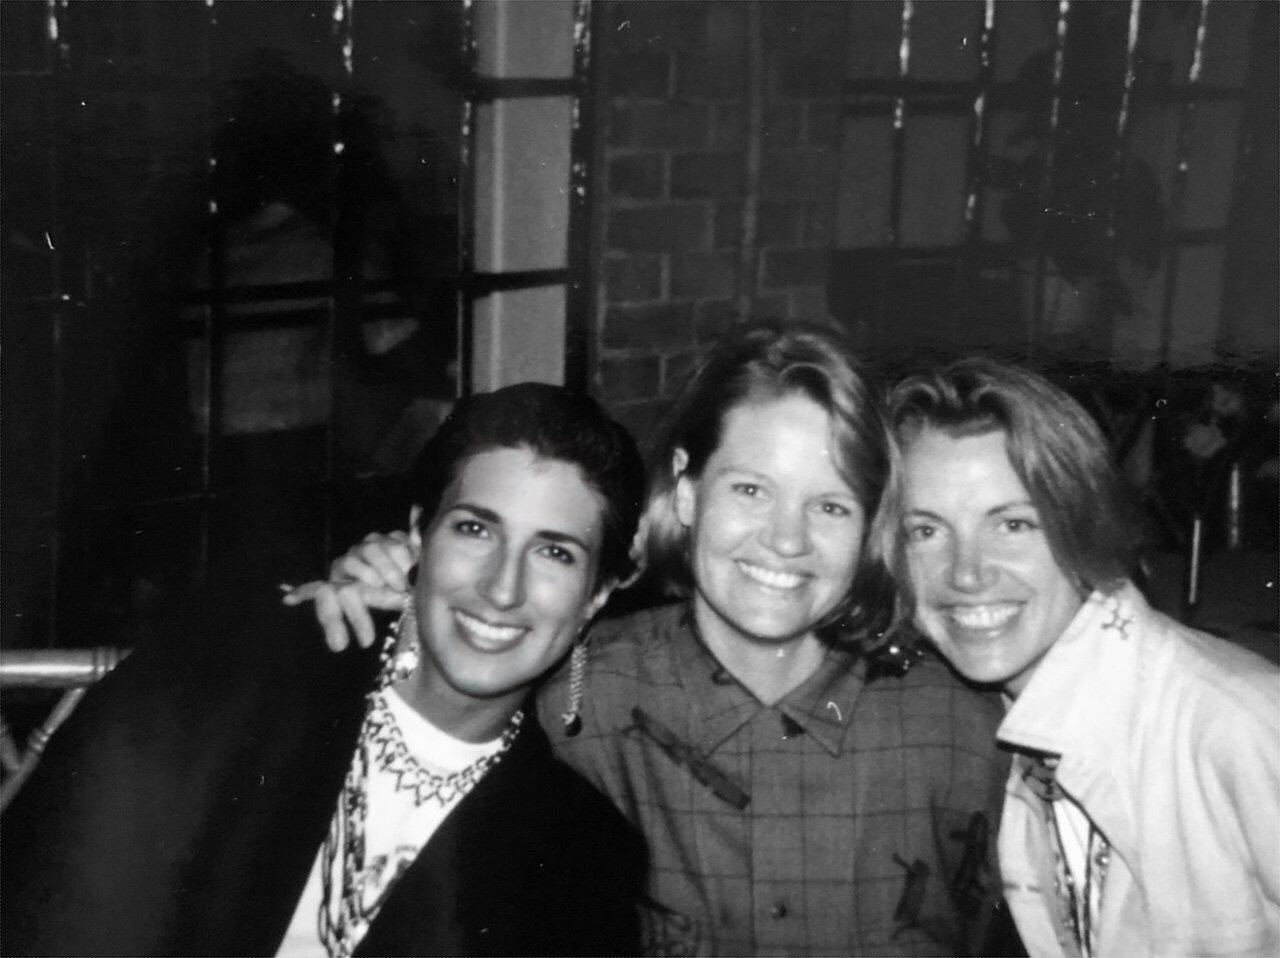 Helen, Jane, and Trish celebrating survival!